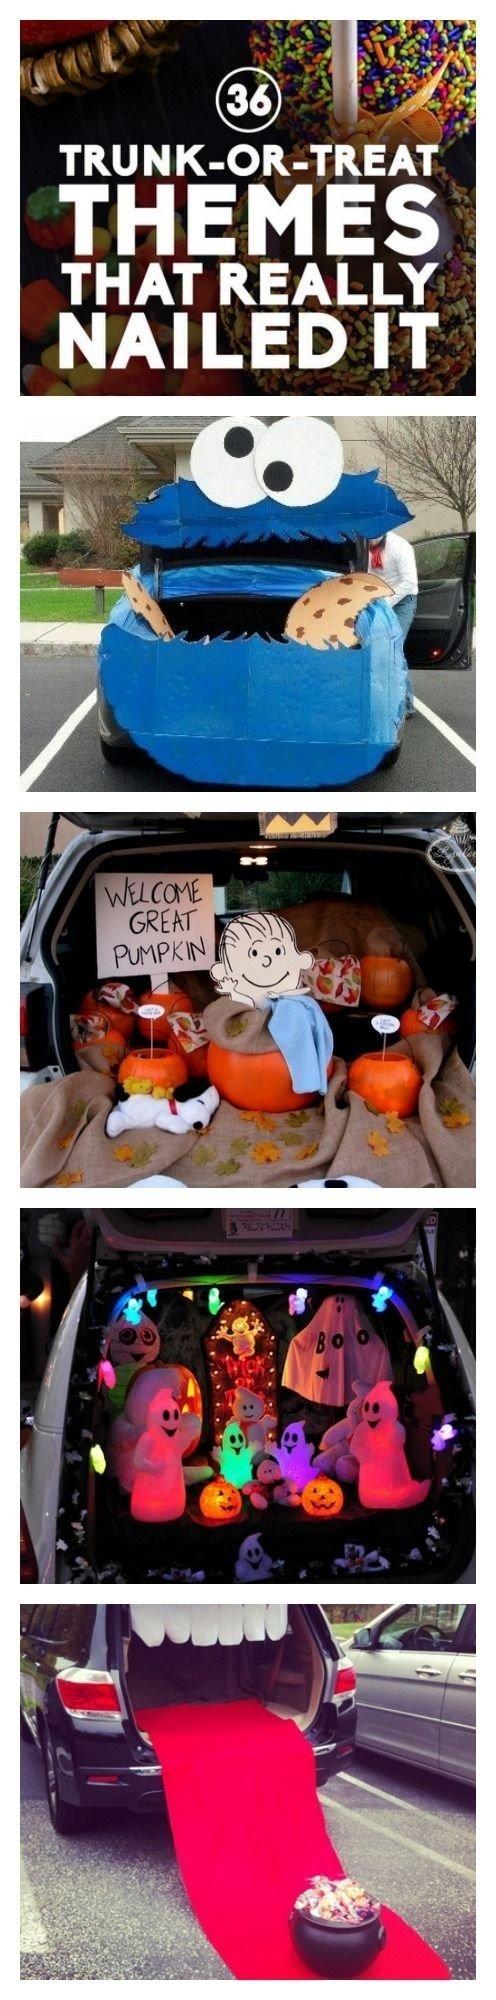 10 Attractive Halloween Trick Or Treat Ideas trunk or treat ideas holidays halloween ideas and holidays halloween 2021